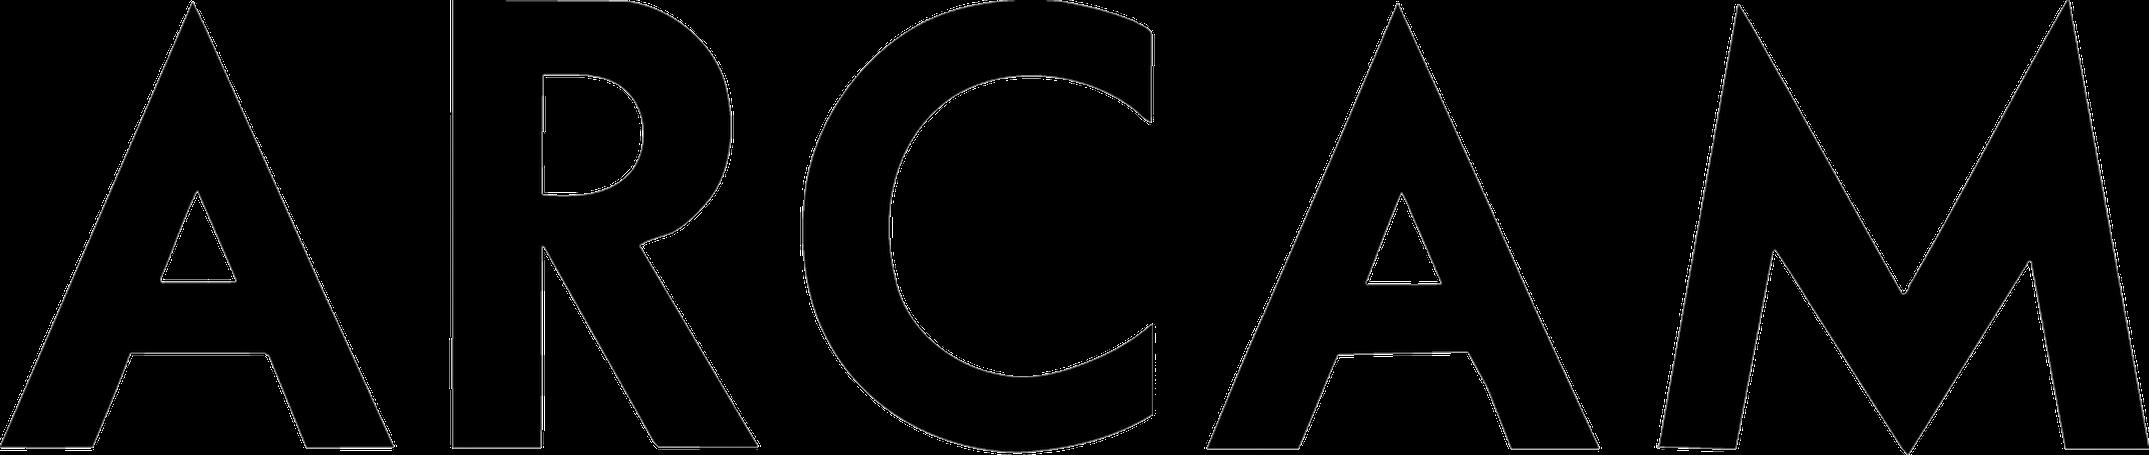 Arcam-logo1.png